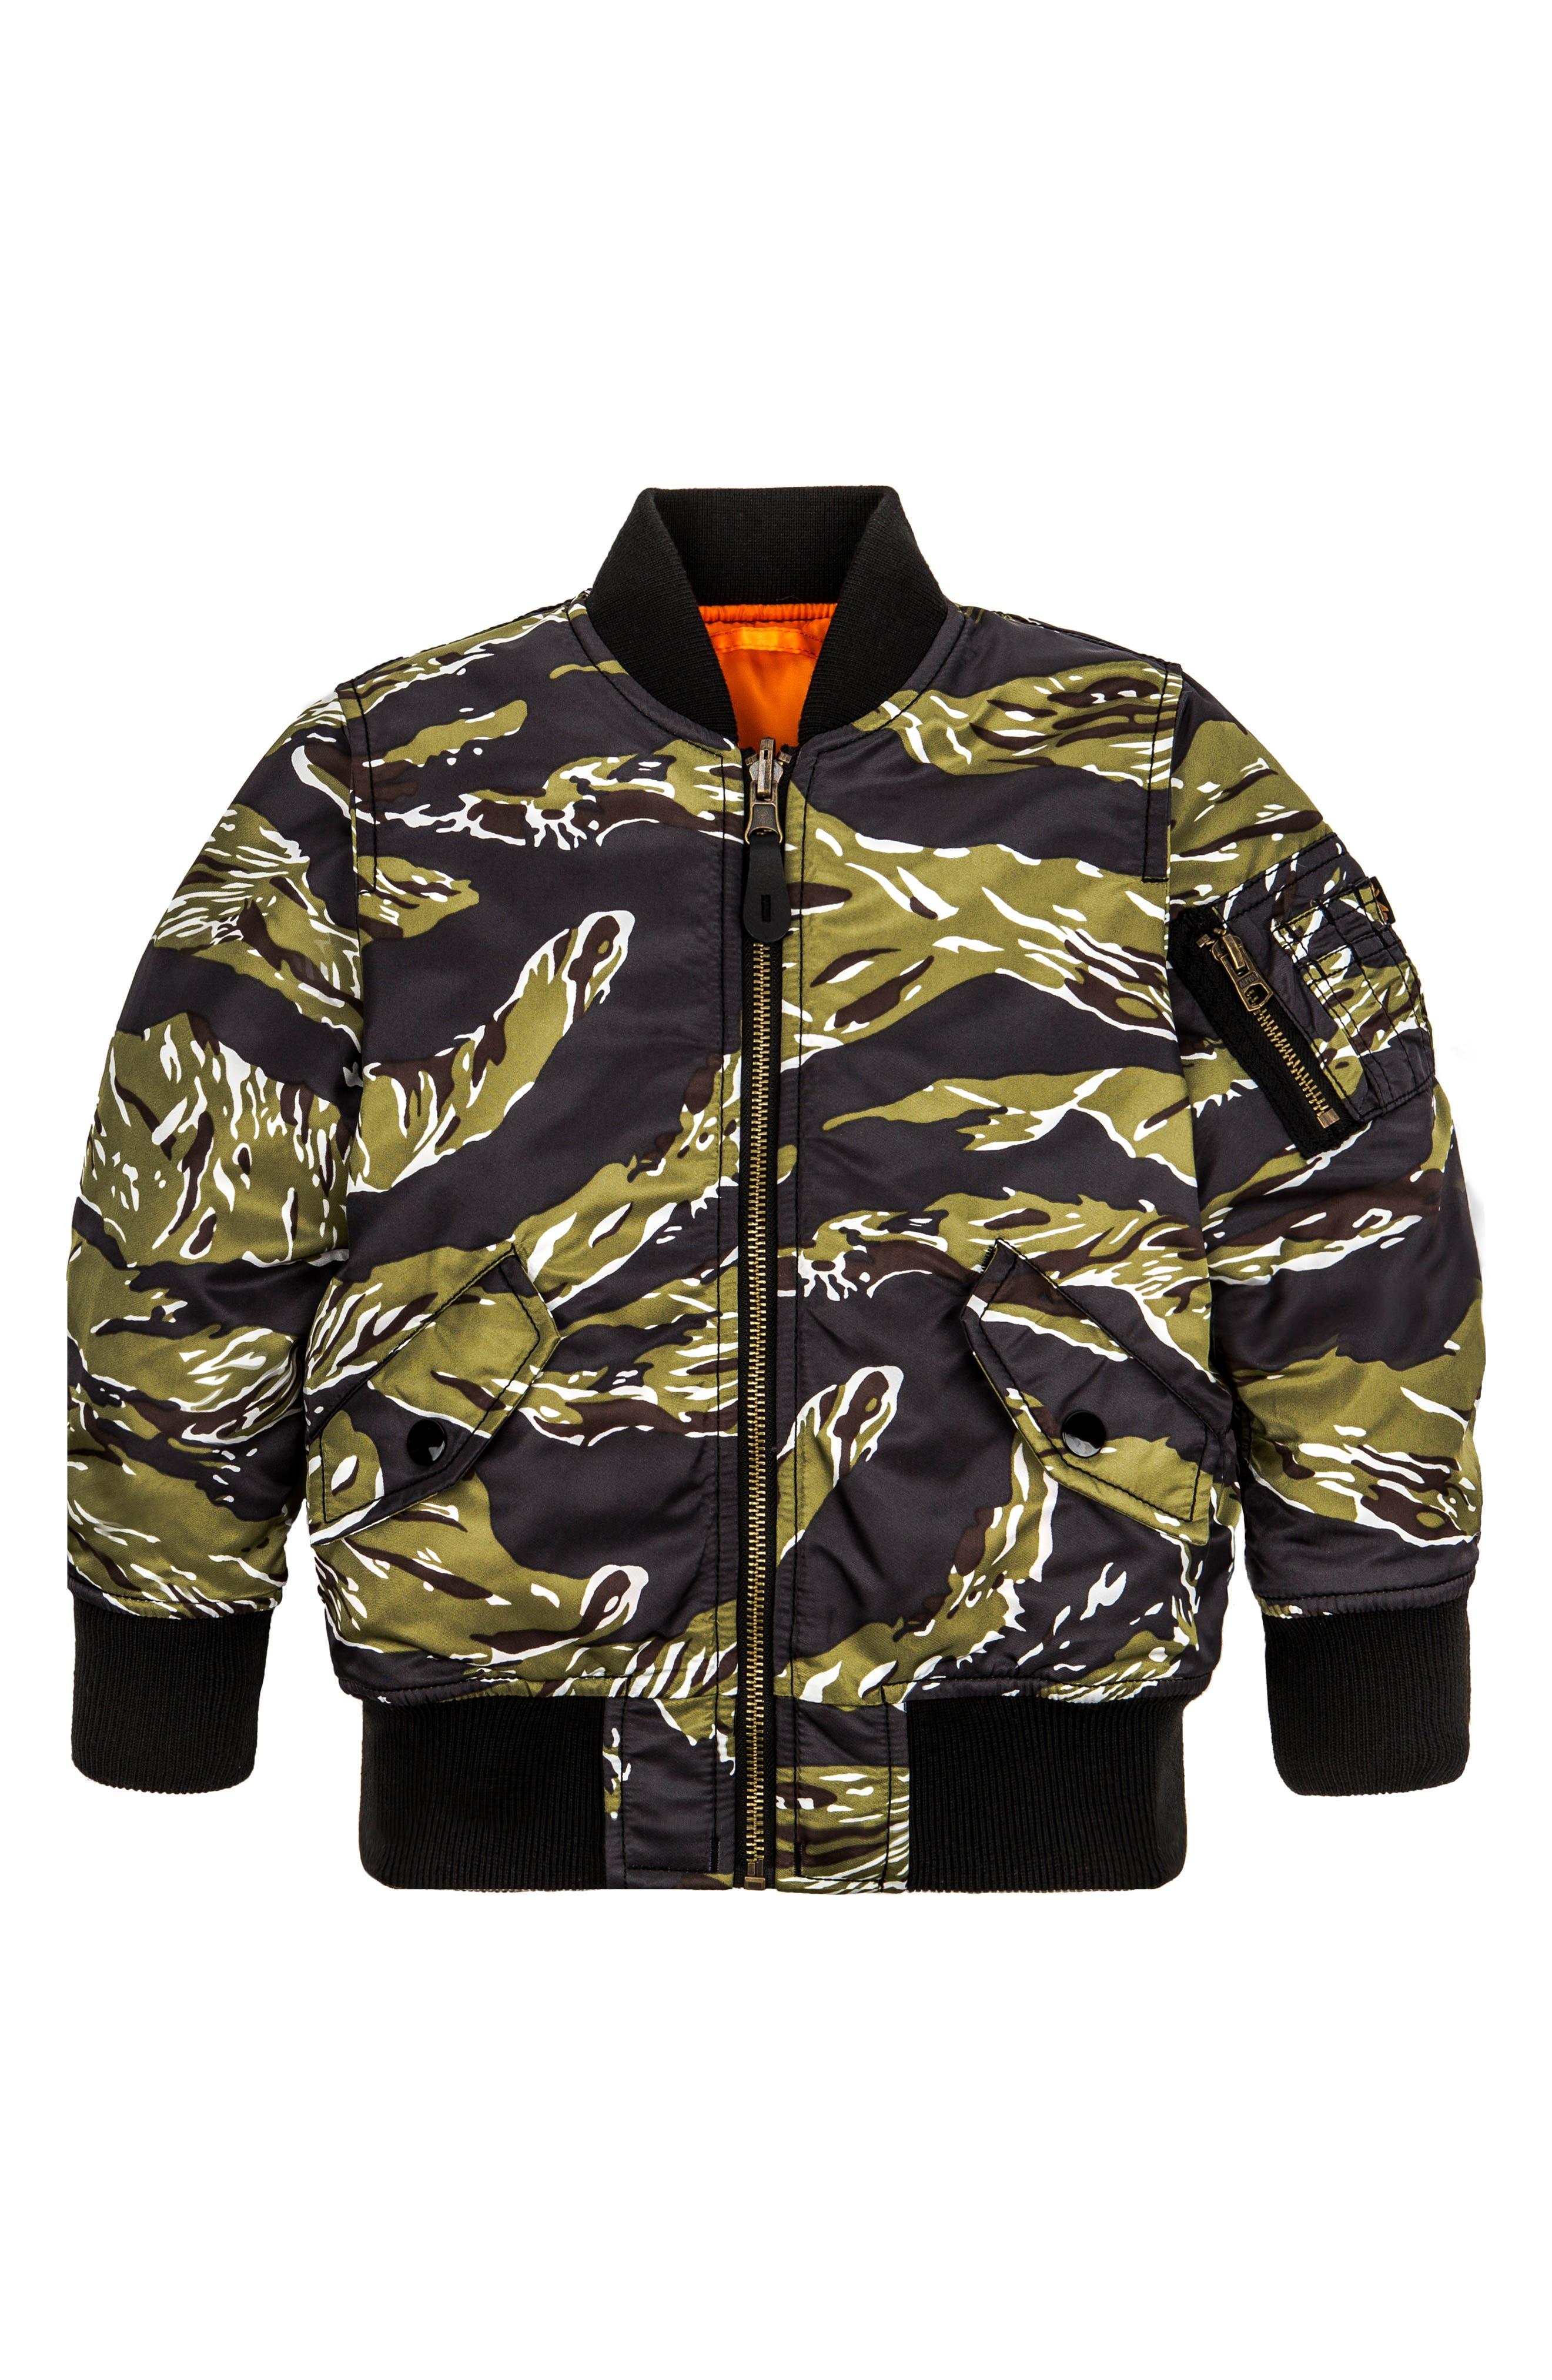 ALPHA INDUSTRIES, MA-1 Flight Jacket, Main thumbnail 1, color, TIGER CAMO